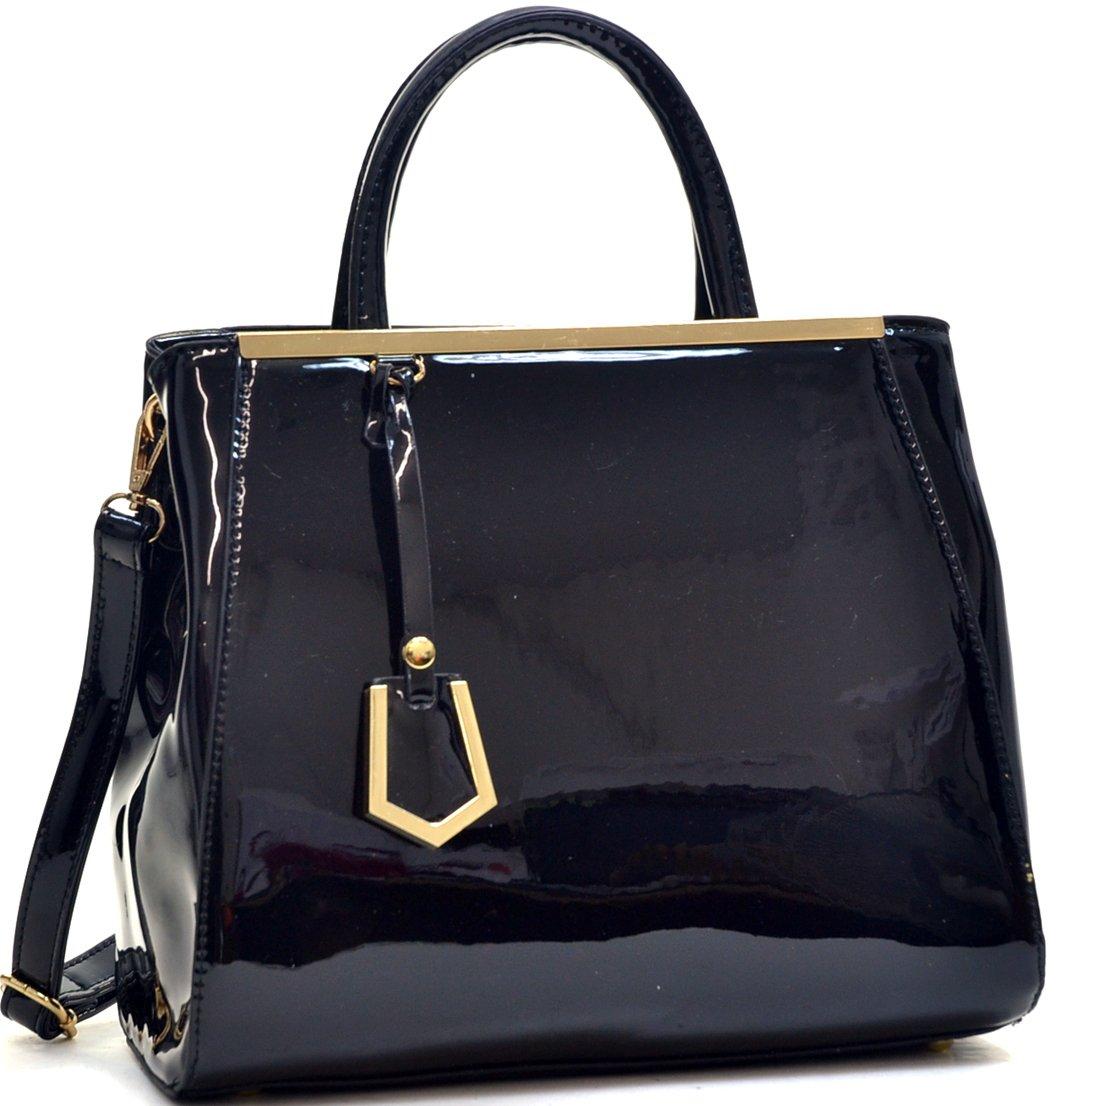 Vintage Handbags, Purses, Bags *New* Womens Fashion Handbag Ostrich Structured Top Handle Satchel Bag Shoulder Bag Tote Purses $34.99 AT vintagedancer.com